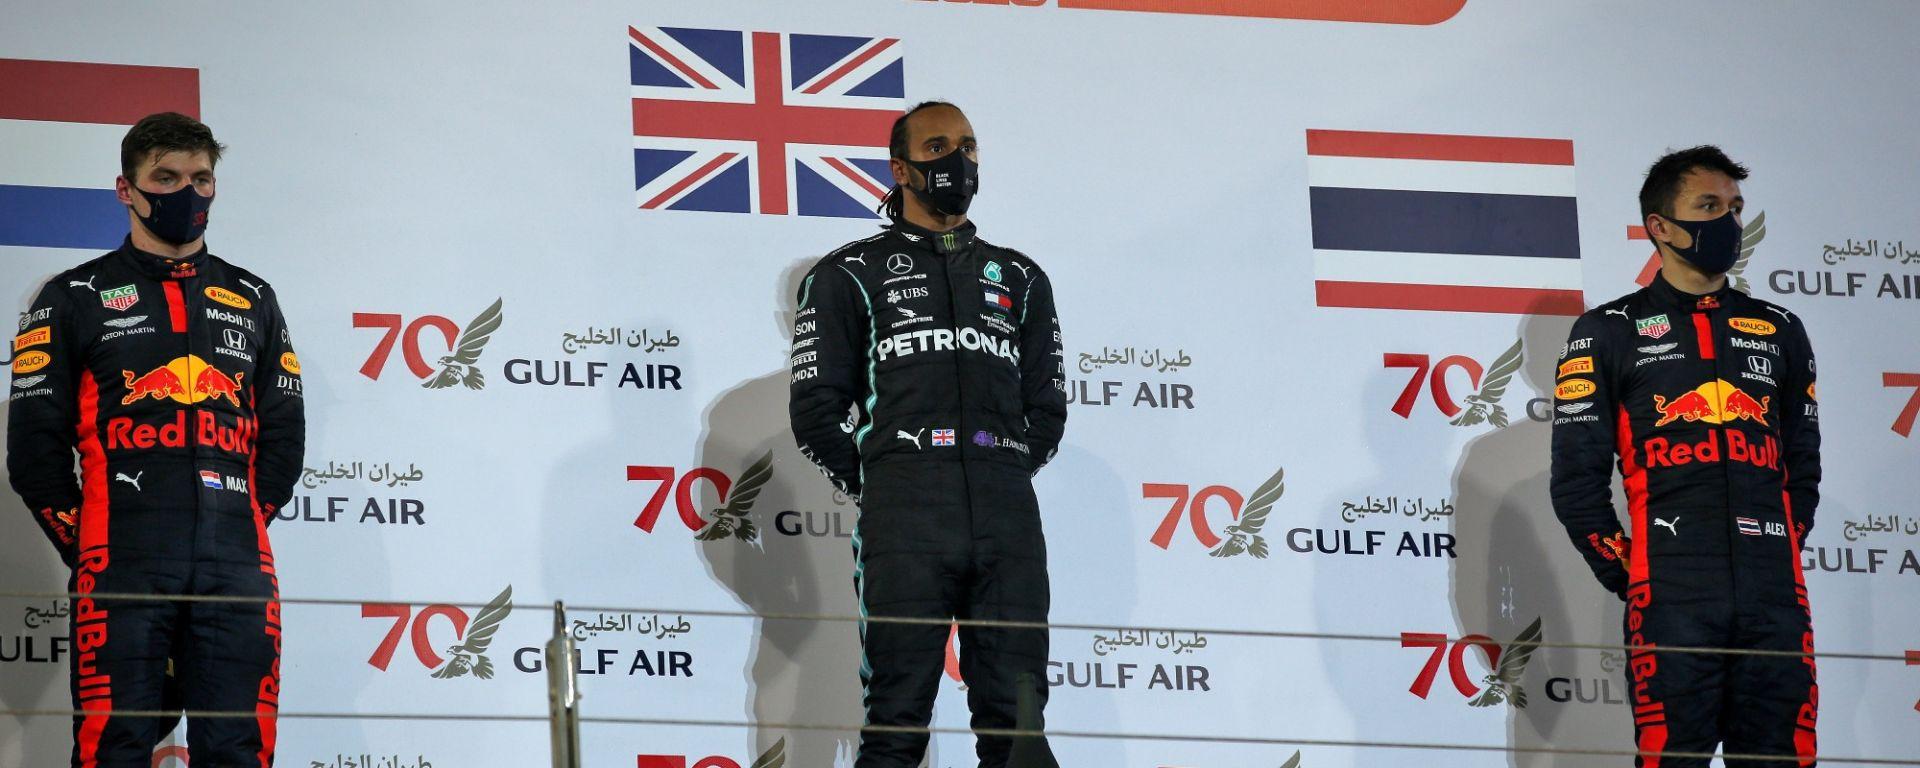 GP Bahrain 2020, Sakhir: podio Lewis Hamilton (Mercedes), Max Verstappen (Red Bull), Alex Albon